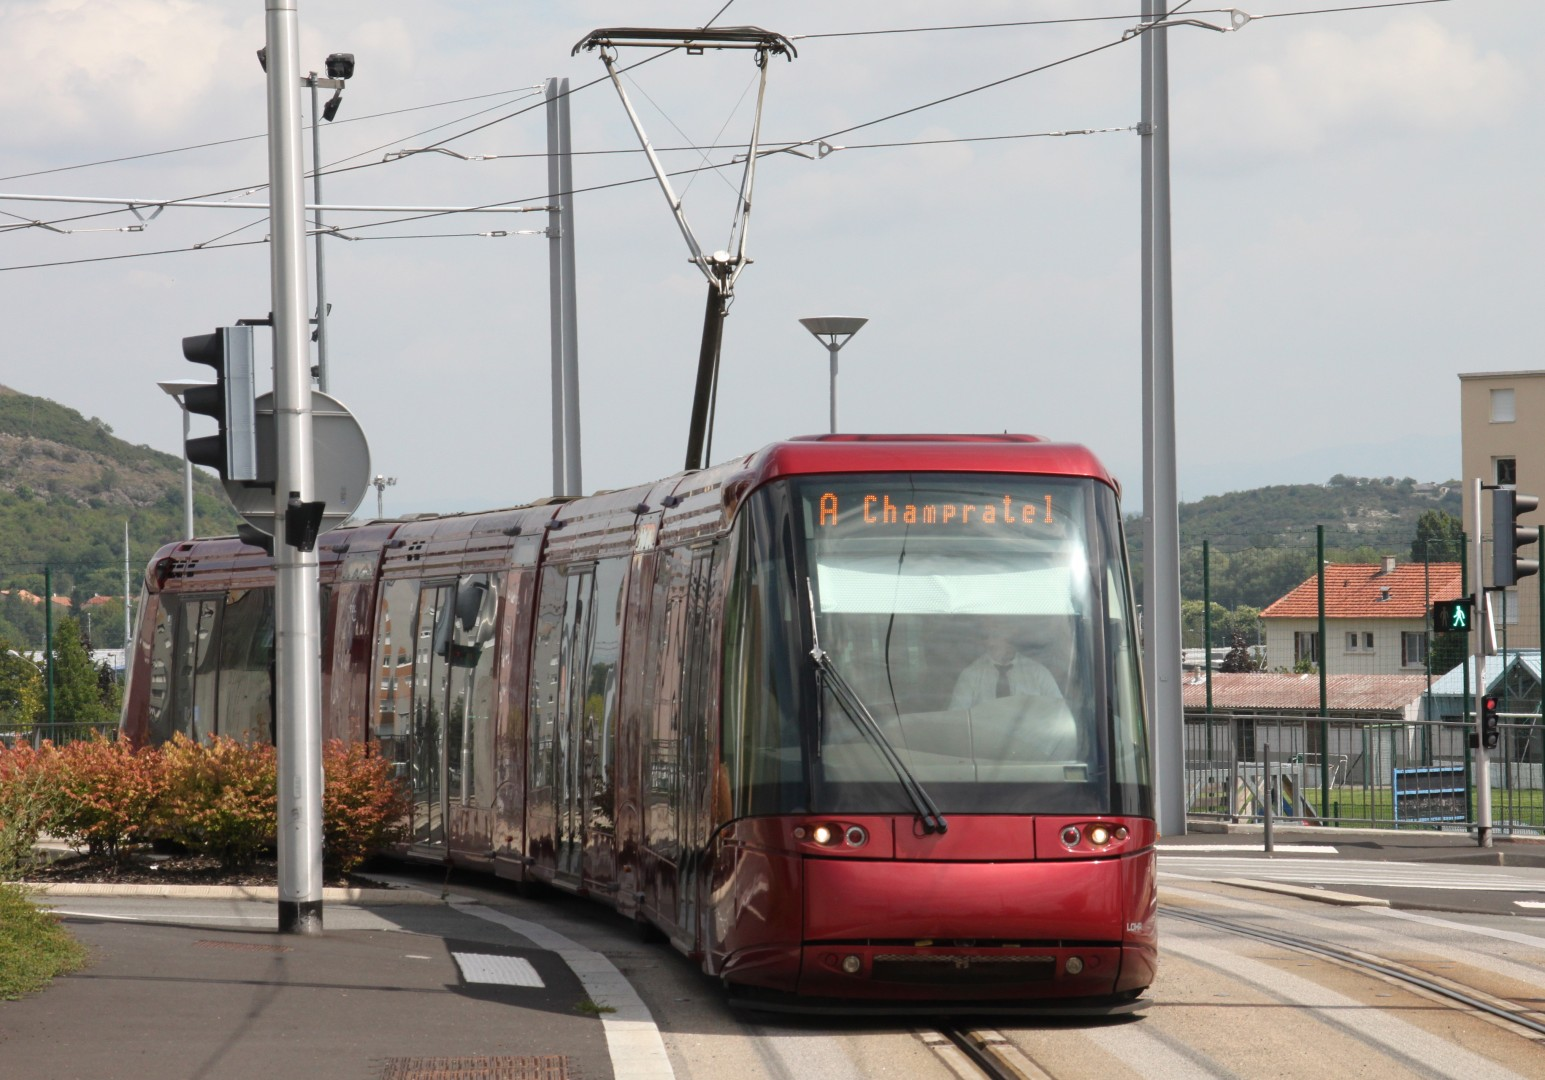 Tranvía Translohr de Clermont-Ferrand. Foto: Maurtis90.